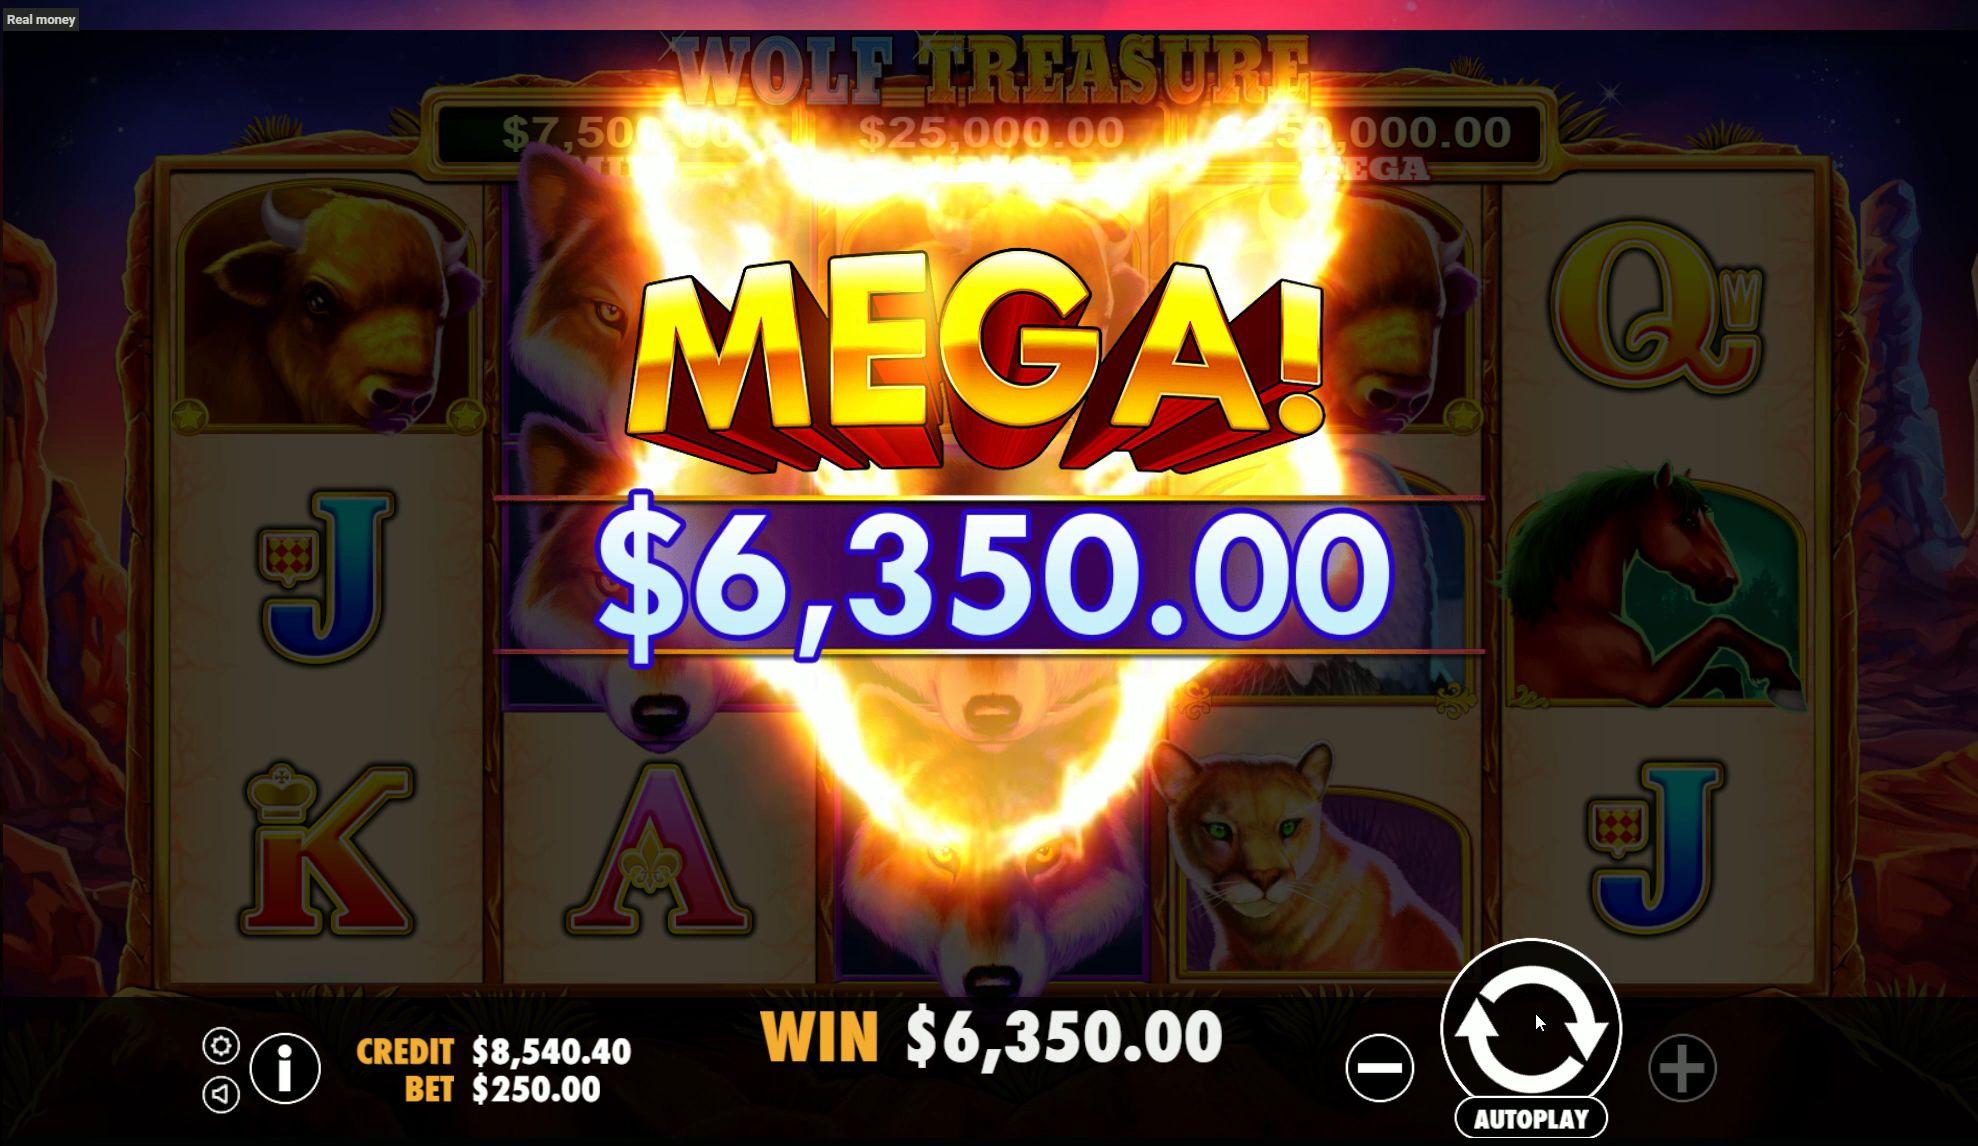 Best Australian Online Casino Online casino slots, Best